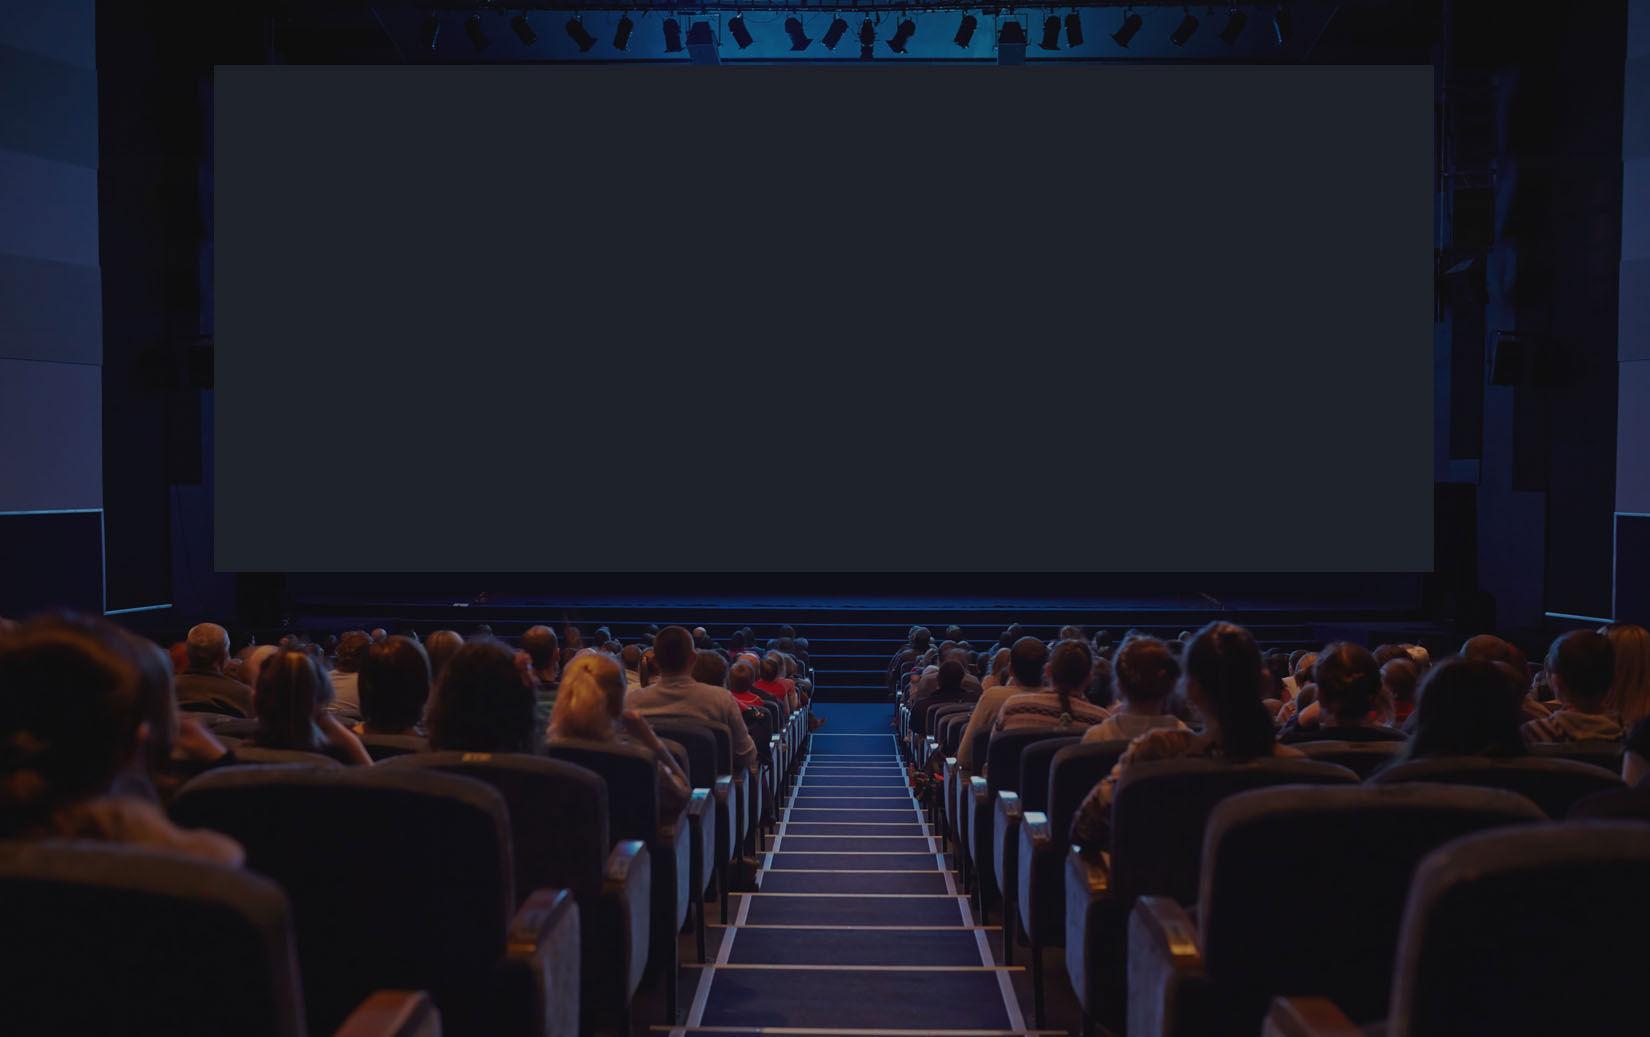 theatre_dark_new-l1-opa68